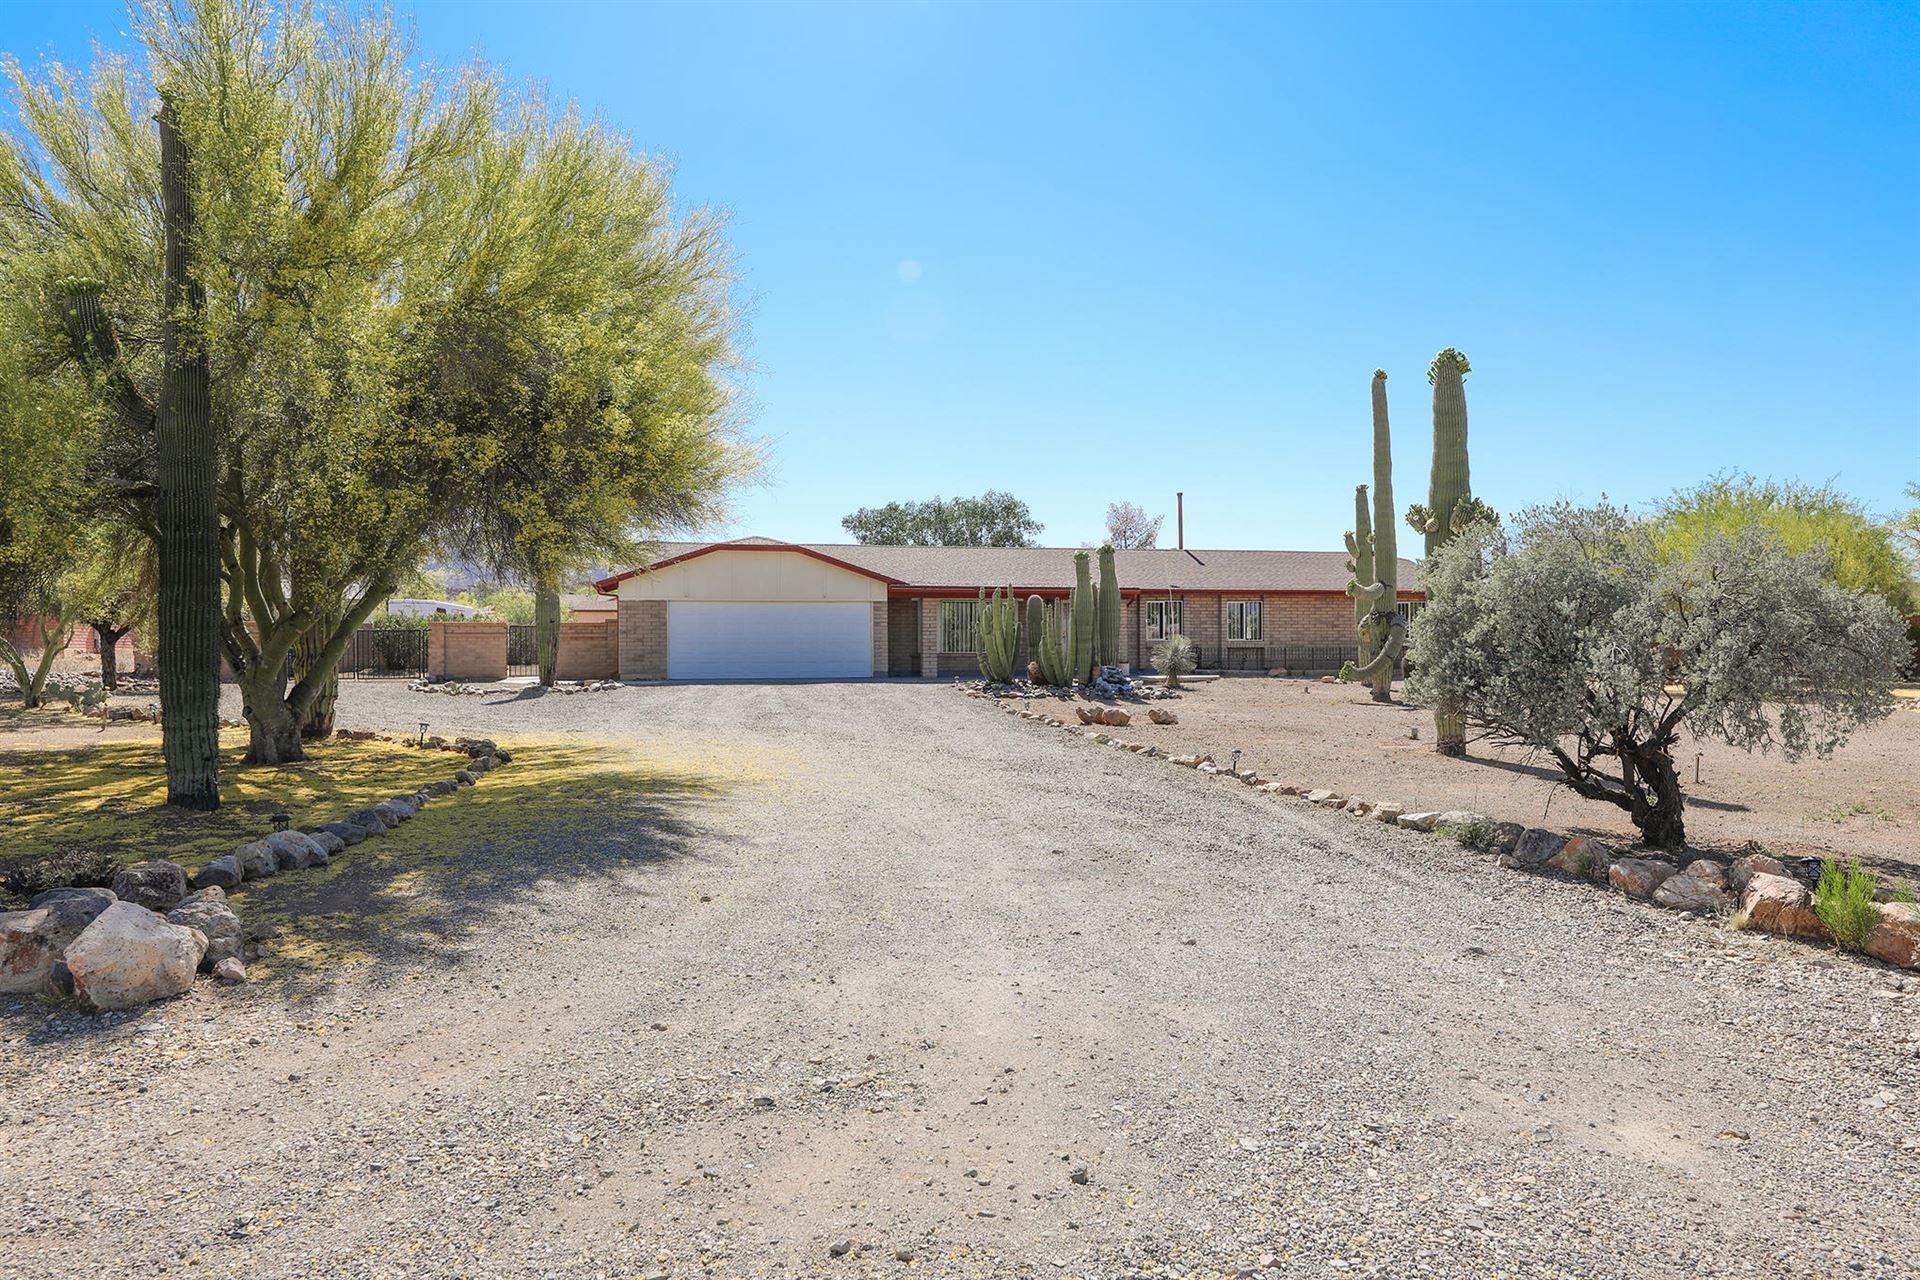 4821 N Calle Llanura, Tucson, AZ 85745 - MLS#: 22112436